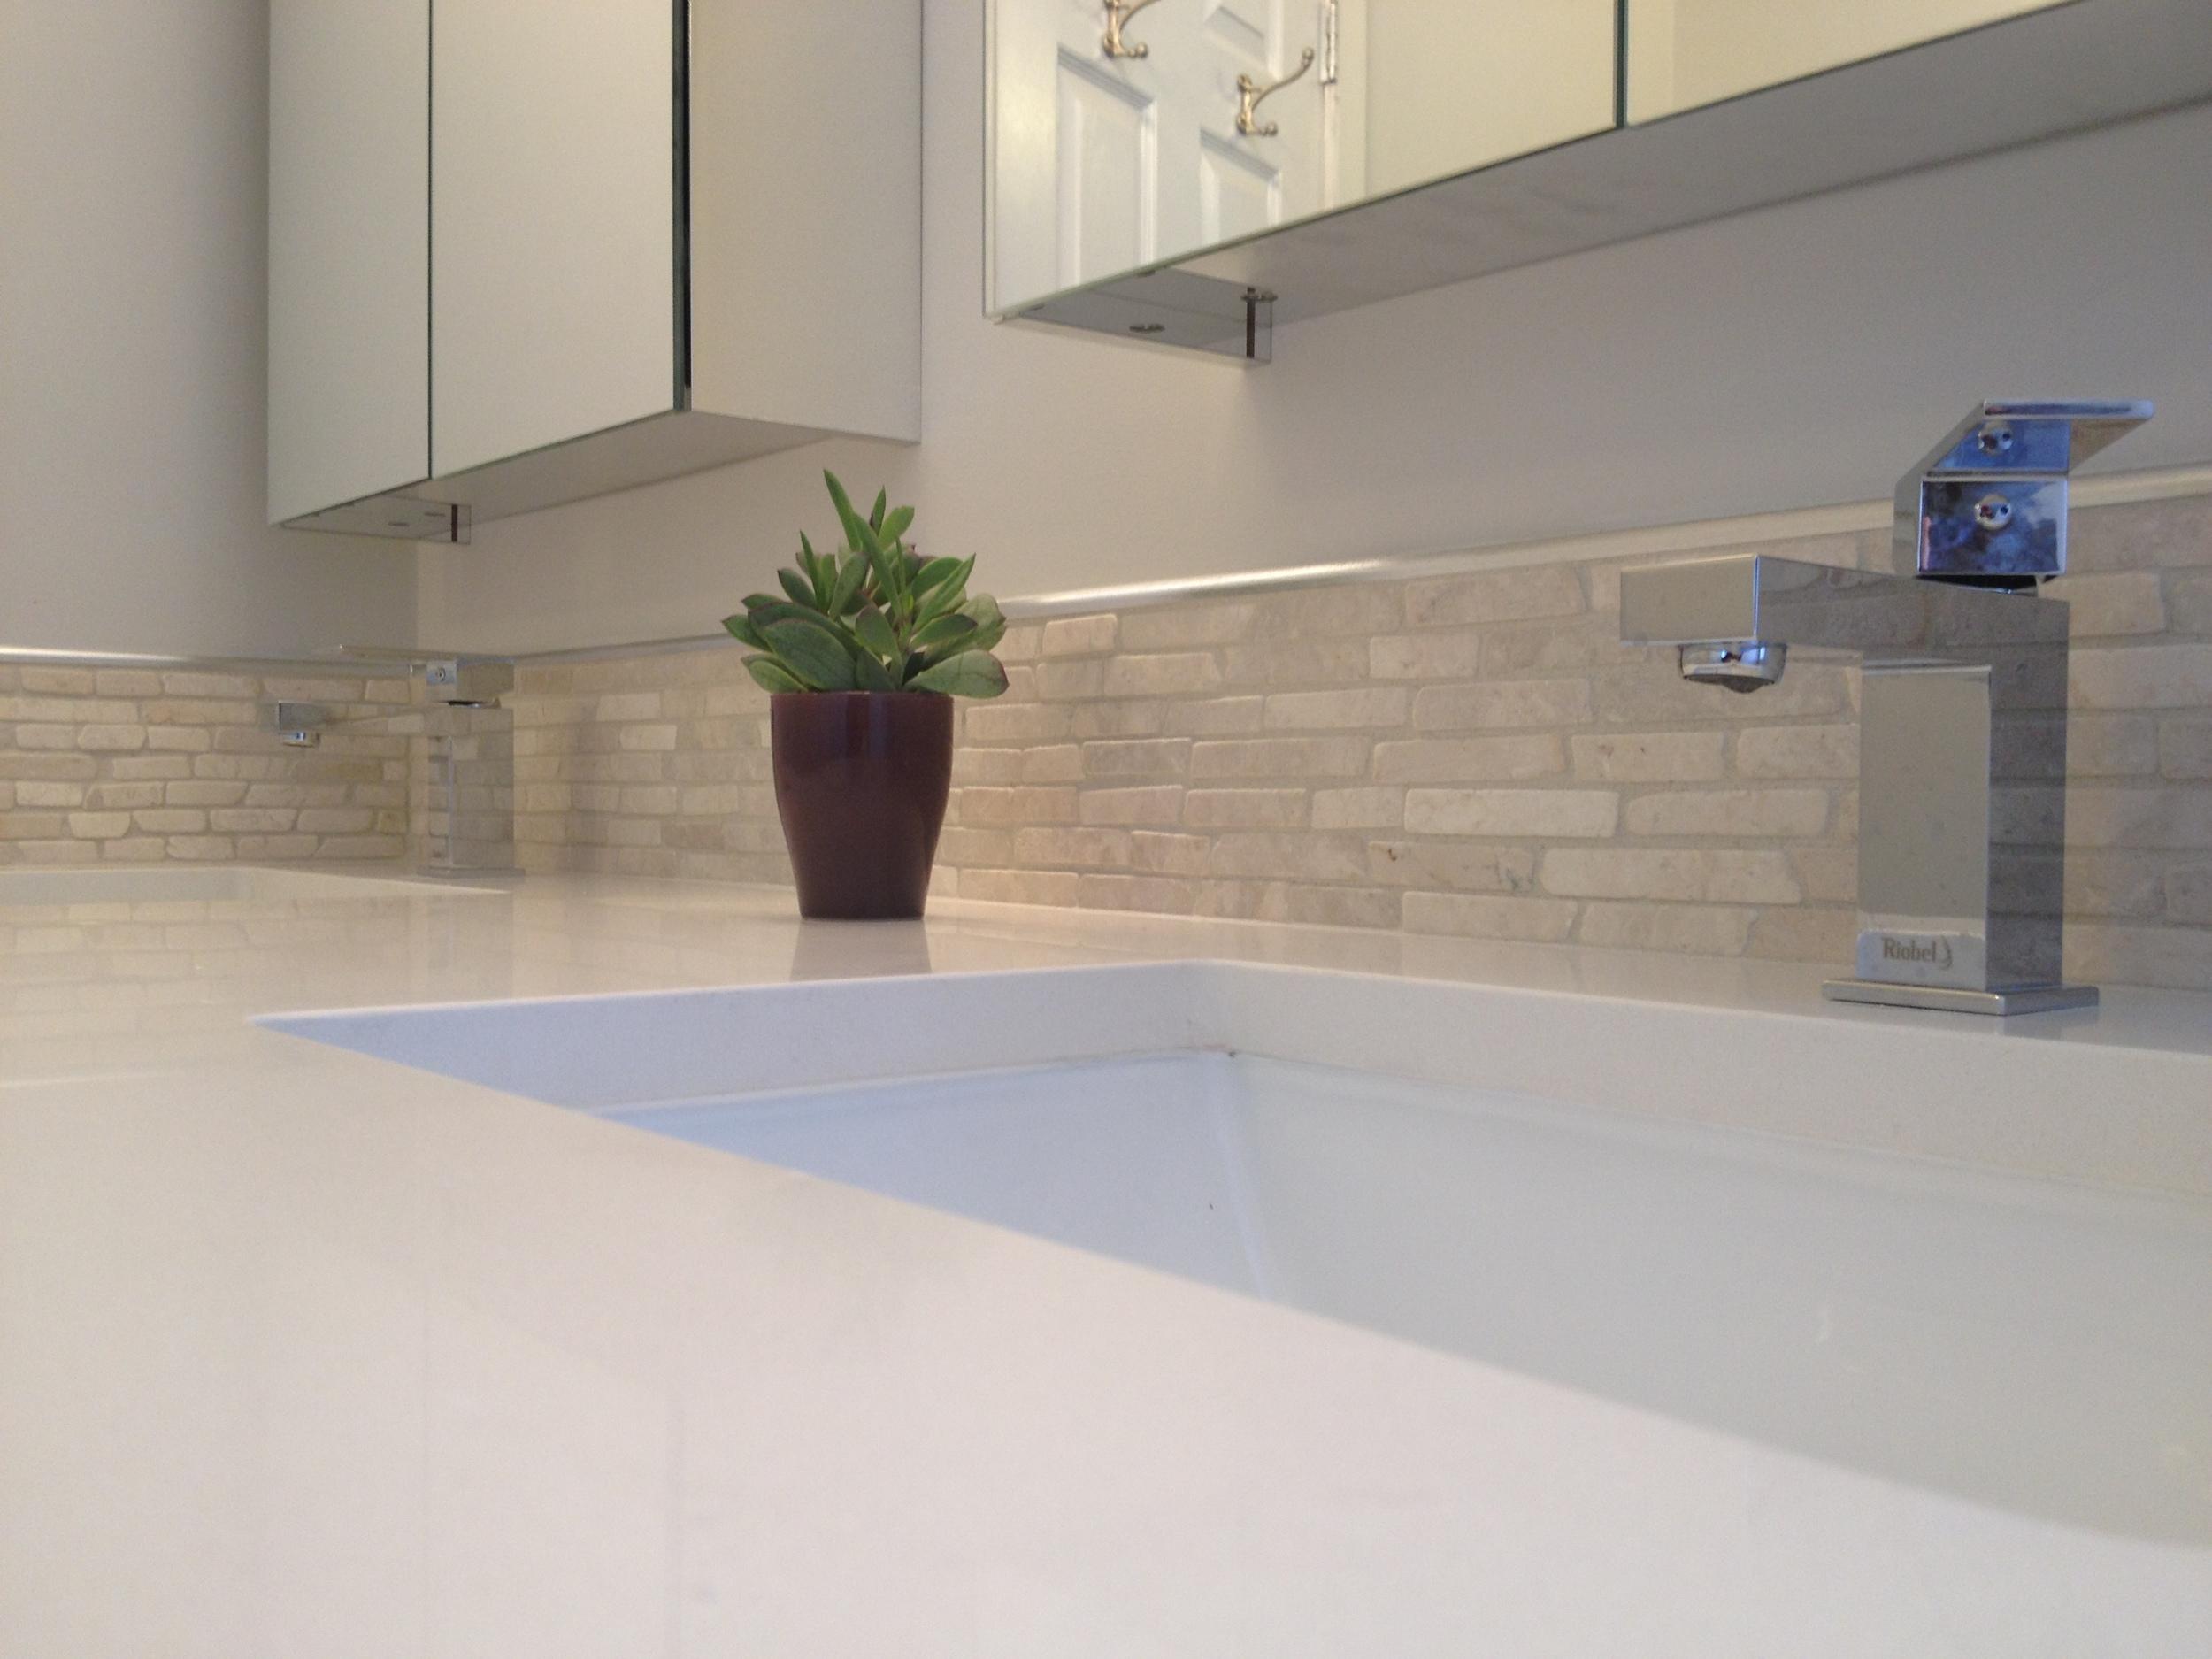 Quartz countertops, stone backsplash and double vanity.